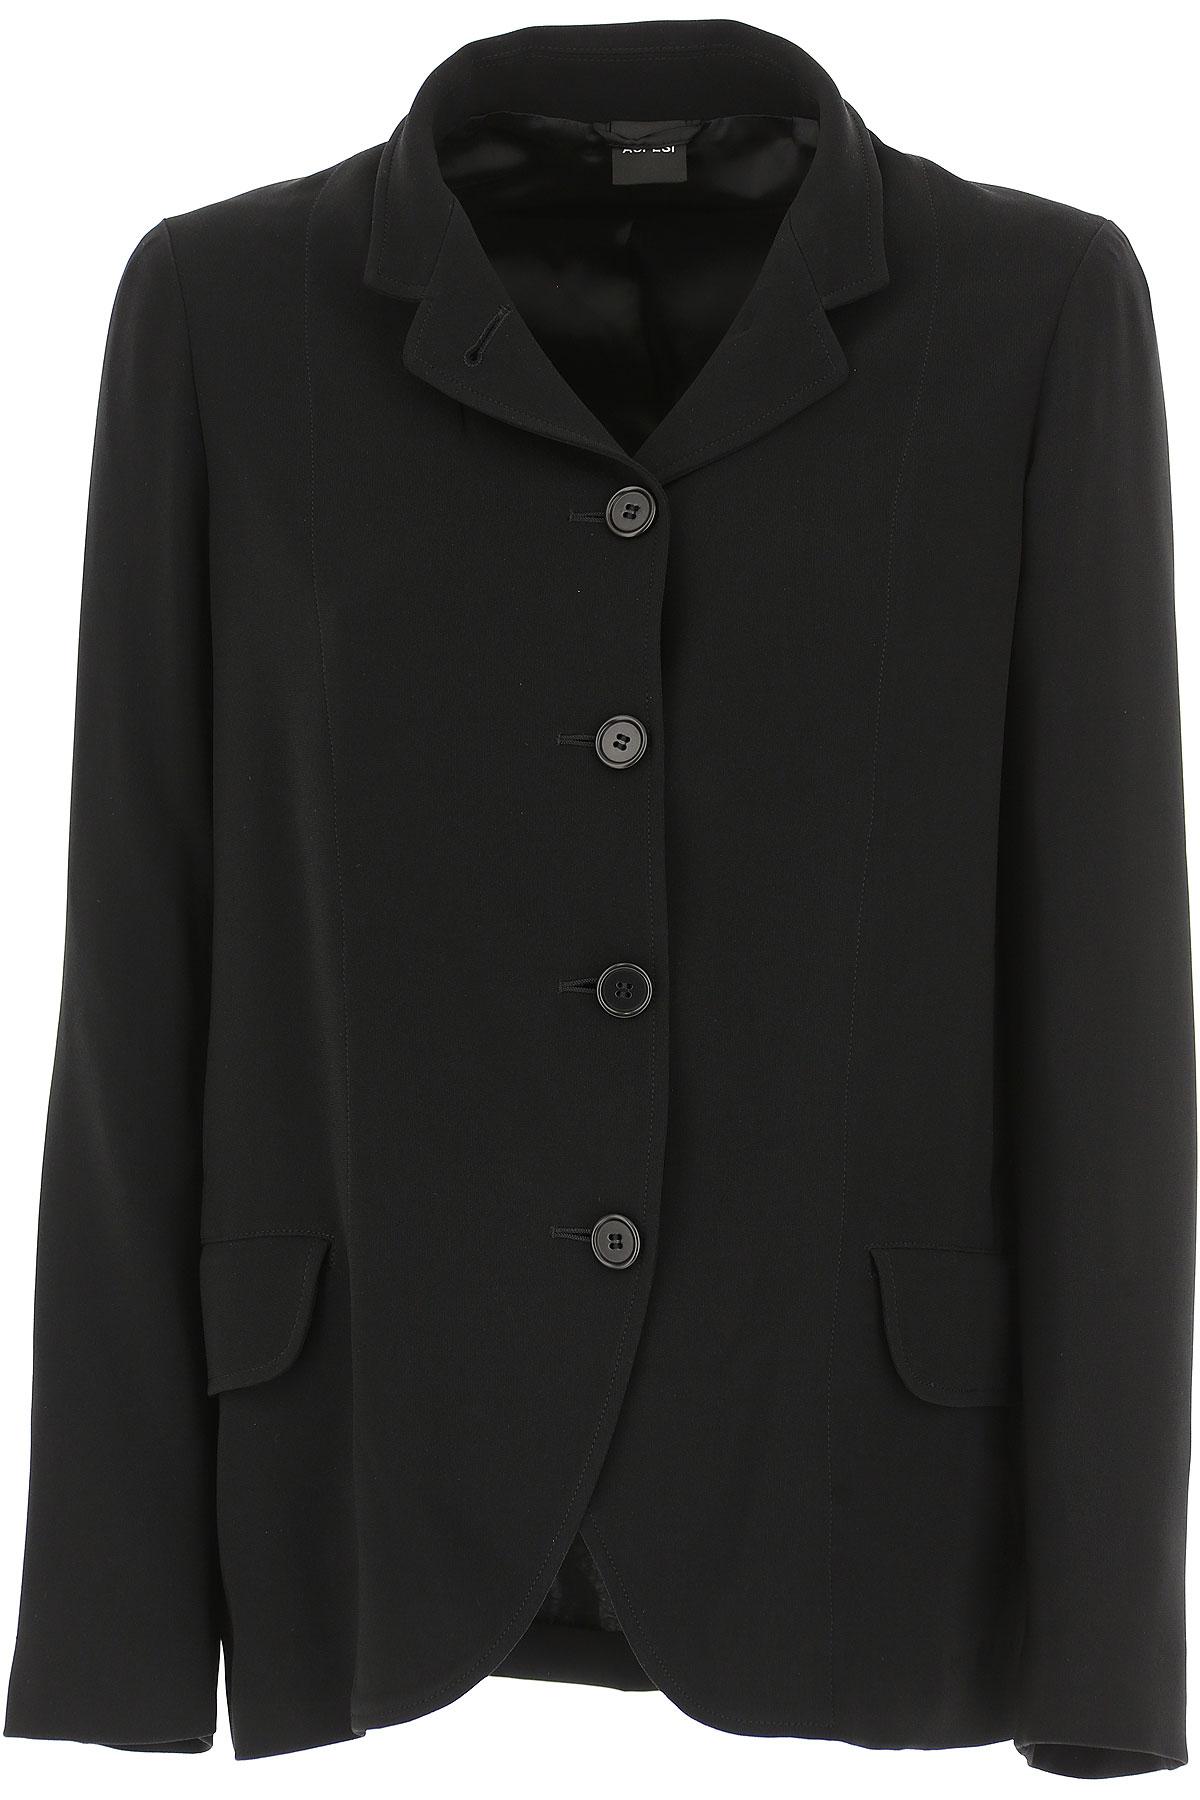 Image of Aspesi Jacket for Women, Black, Triacetate, 2017, 10 4 6 8